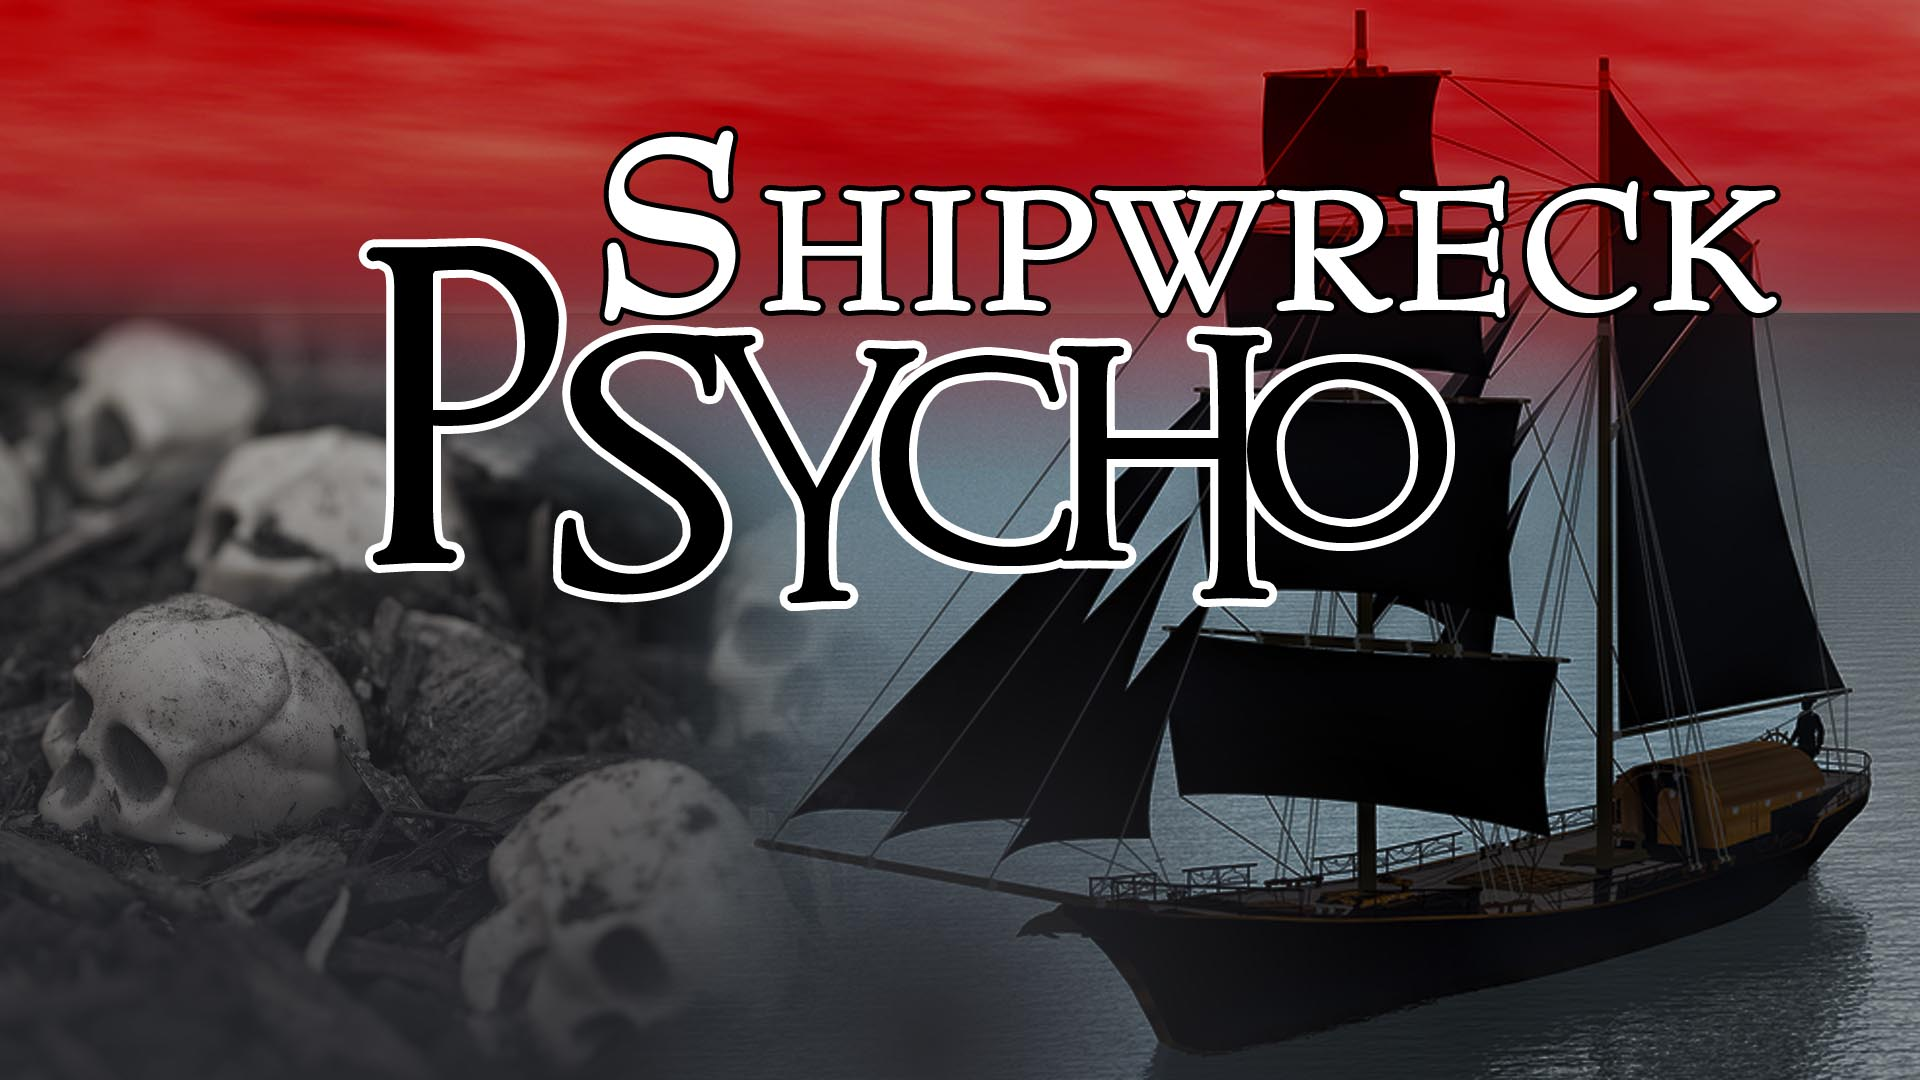 Shipwreck Psycho